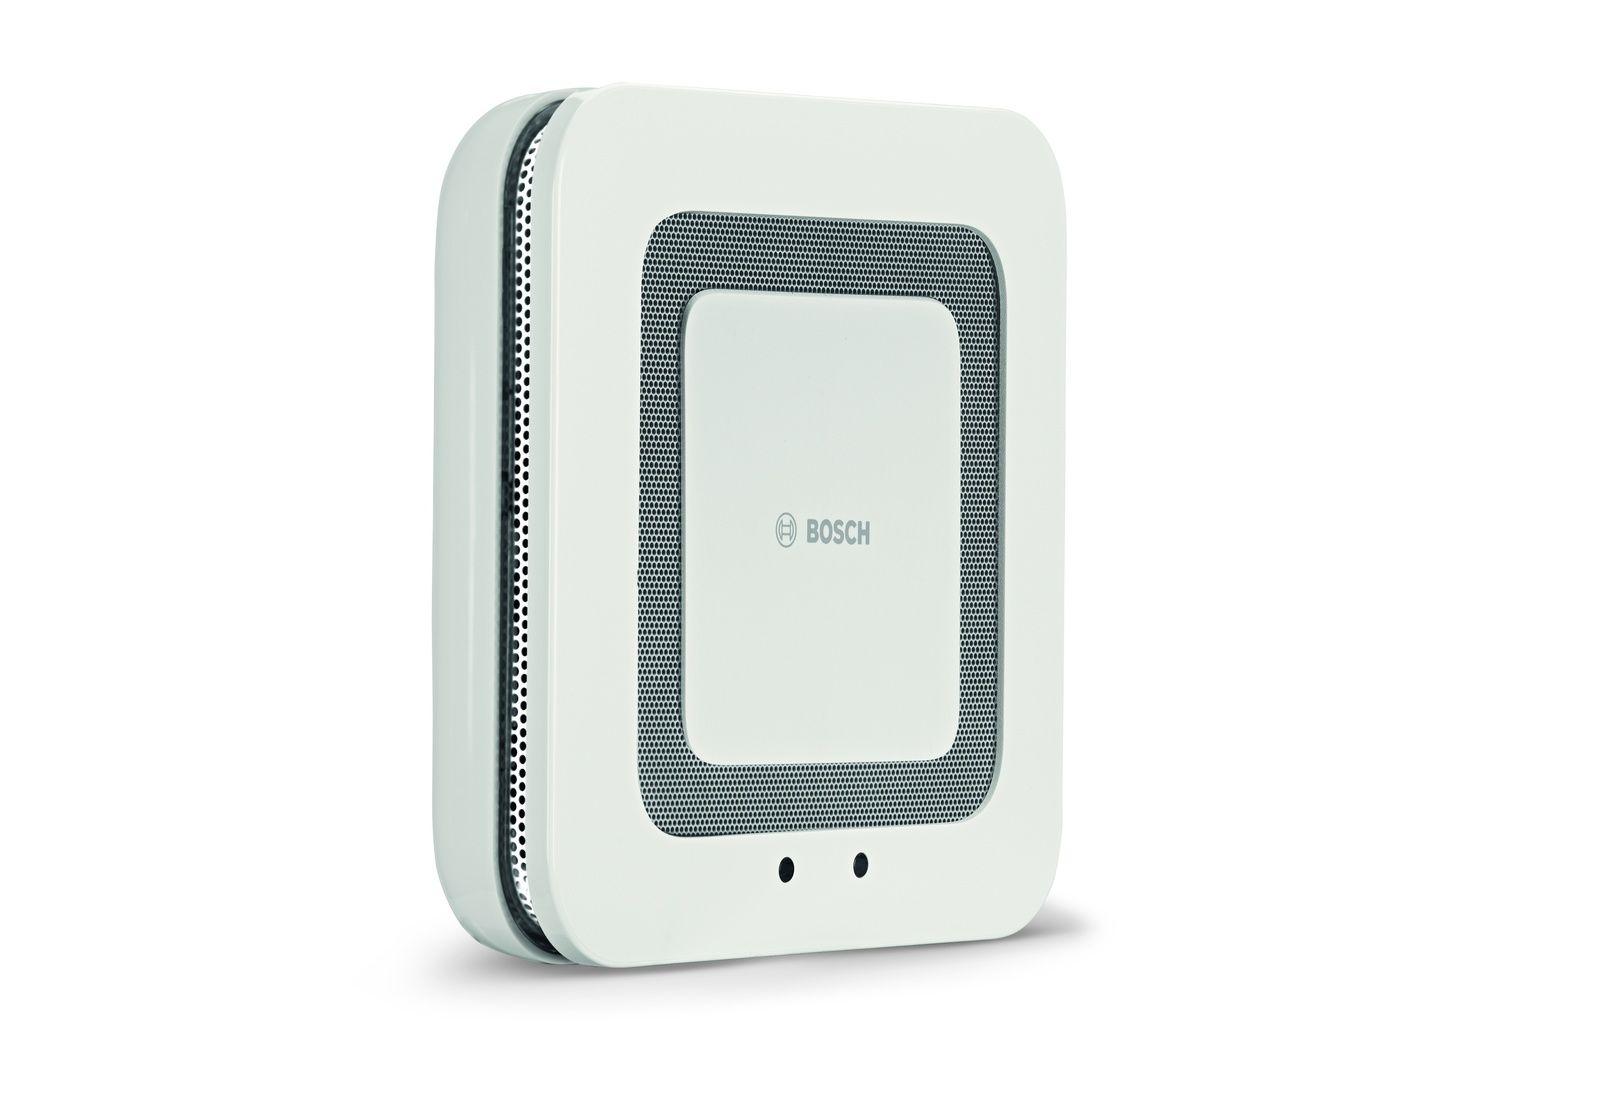 Bosch Smart Home Twinguard Smoke Alarm With Air Sensor Minimalistische Wonen